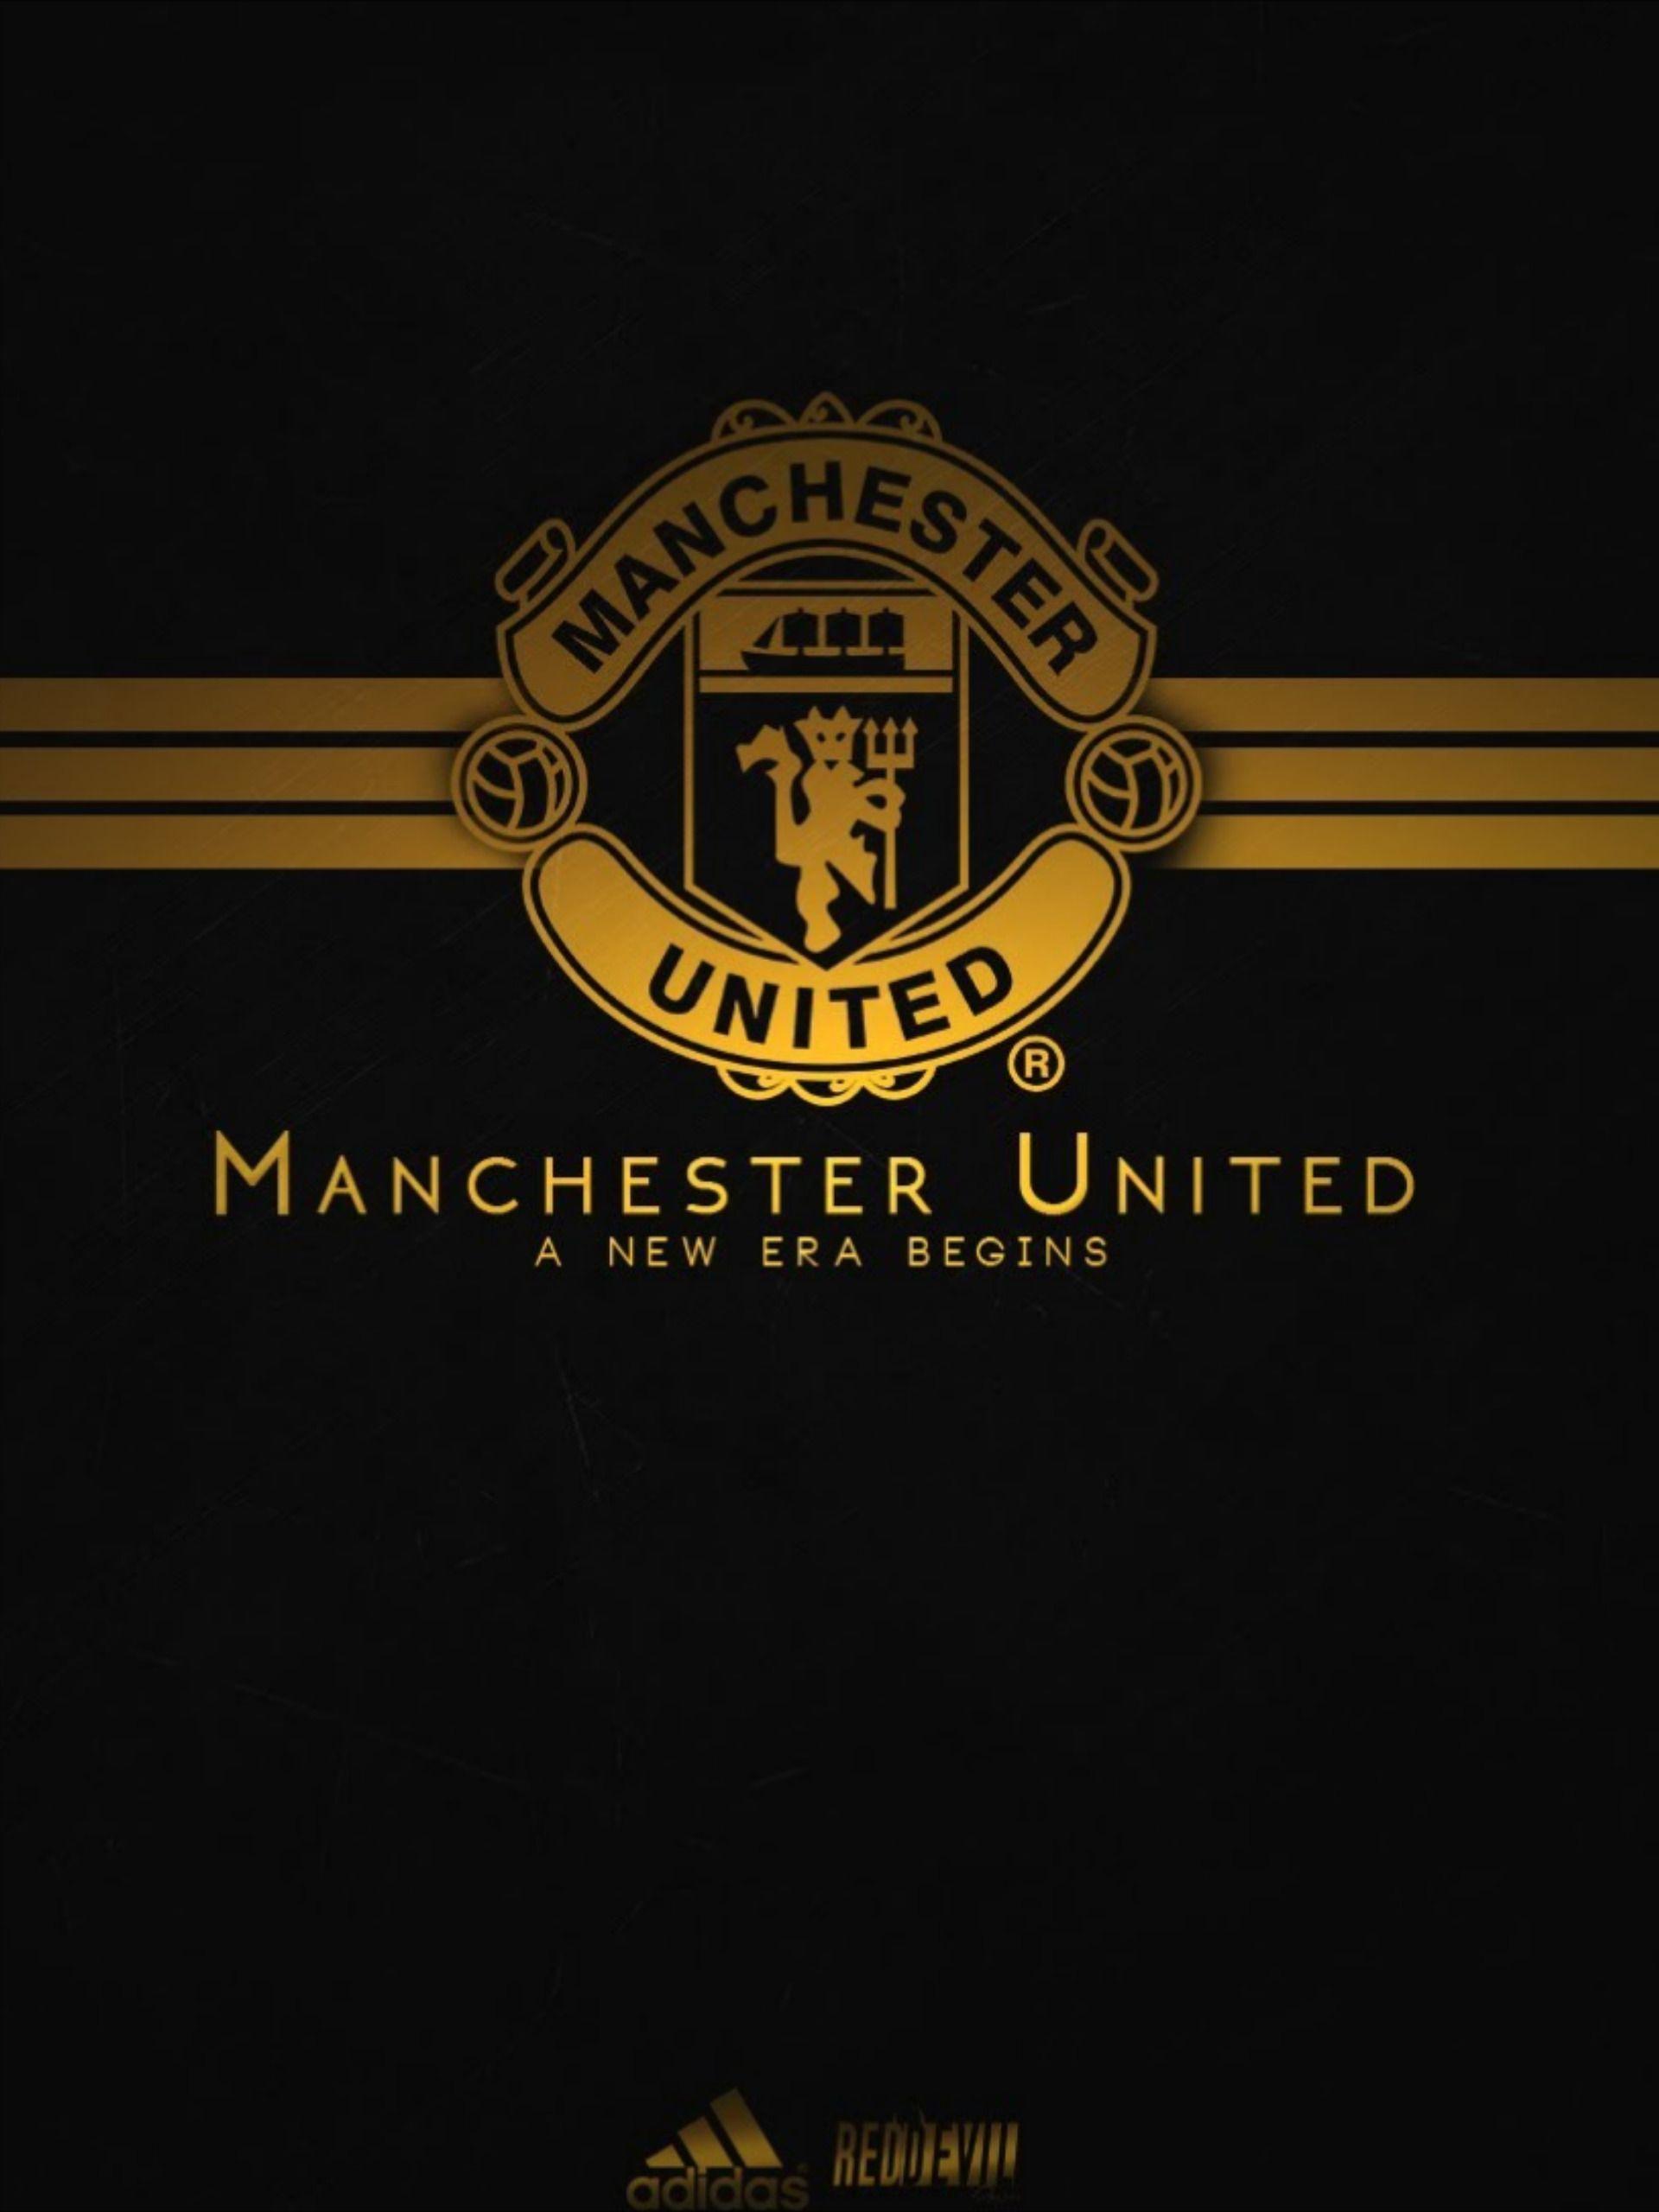 Manchester United A New Era Begins Manchester United Manchester United Logo Manchester United Wallpaper